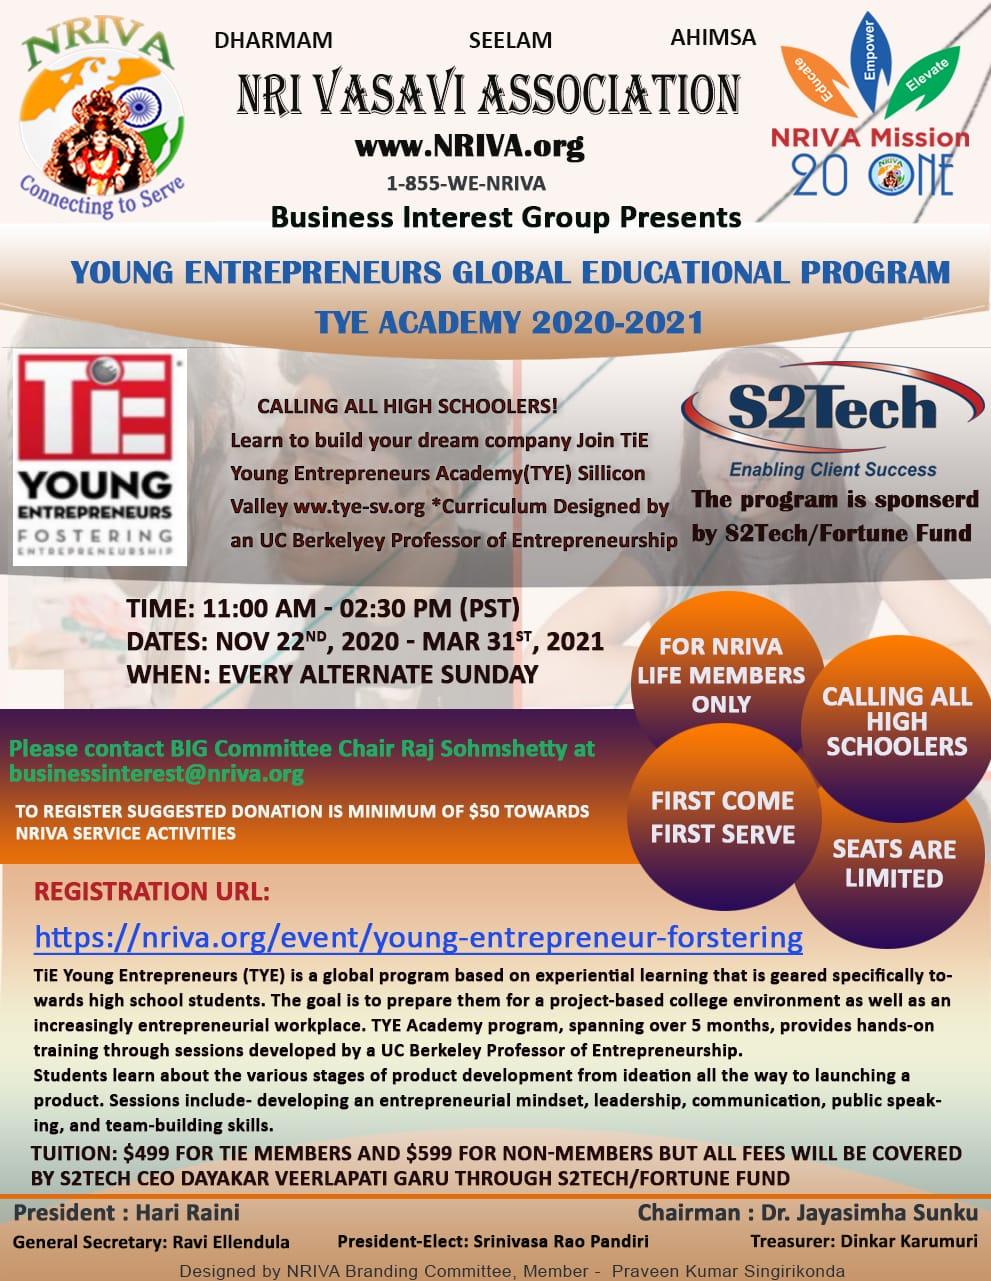 Young Entrepreneur Fostering